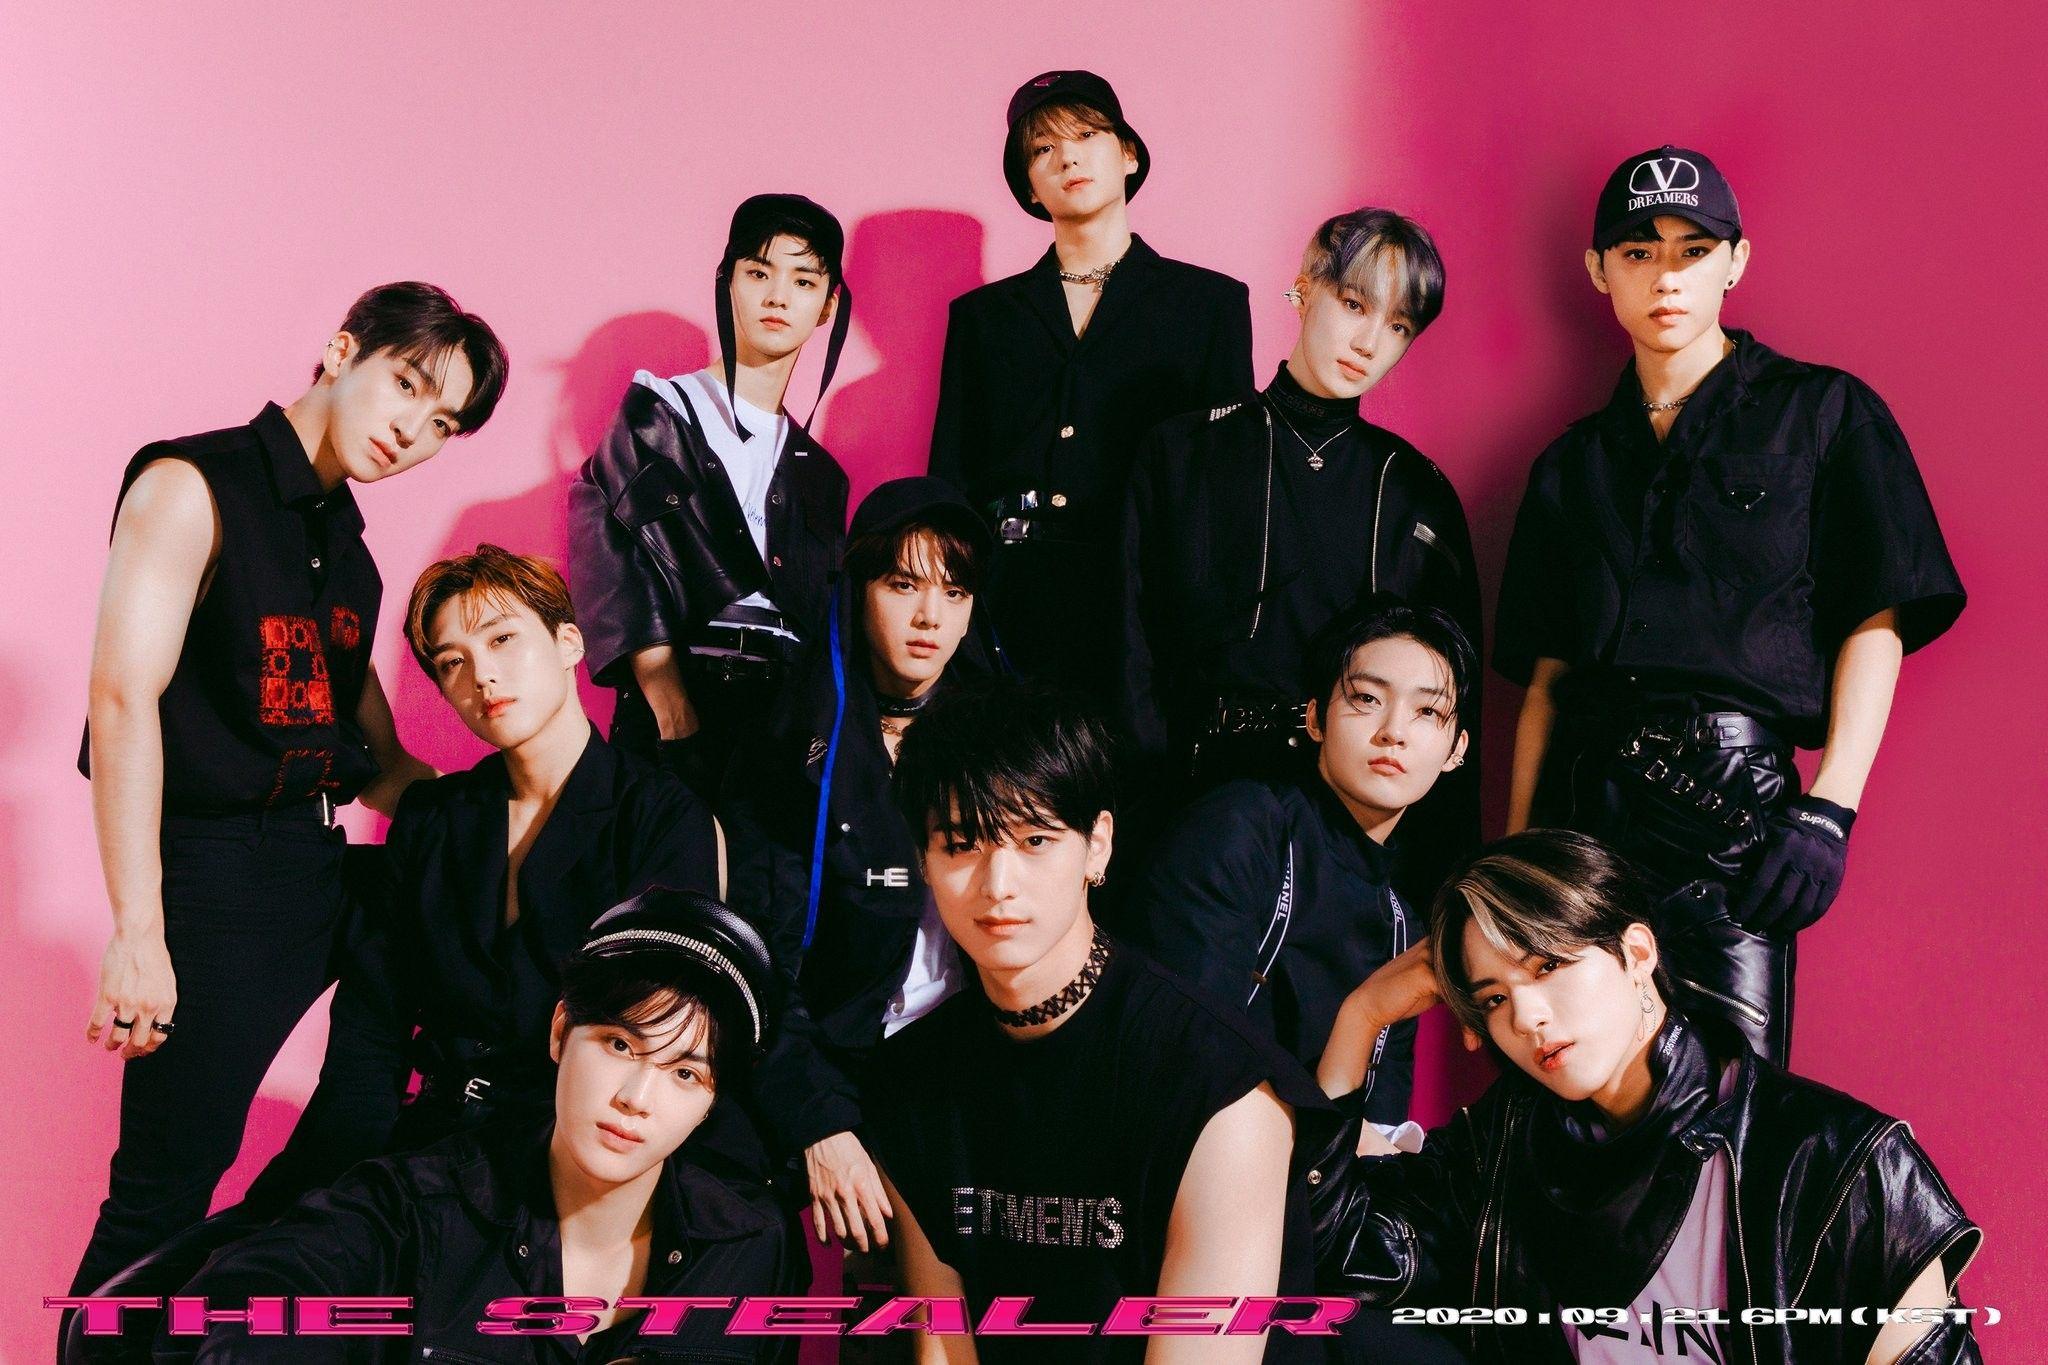 The Boyz 5th Mini Album Chase In 2020 Mini Albums Stealer K Pop Star